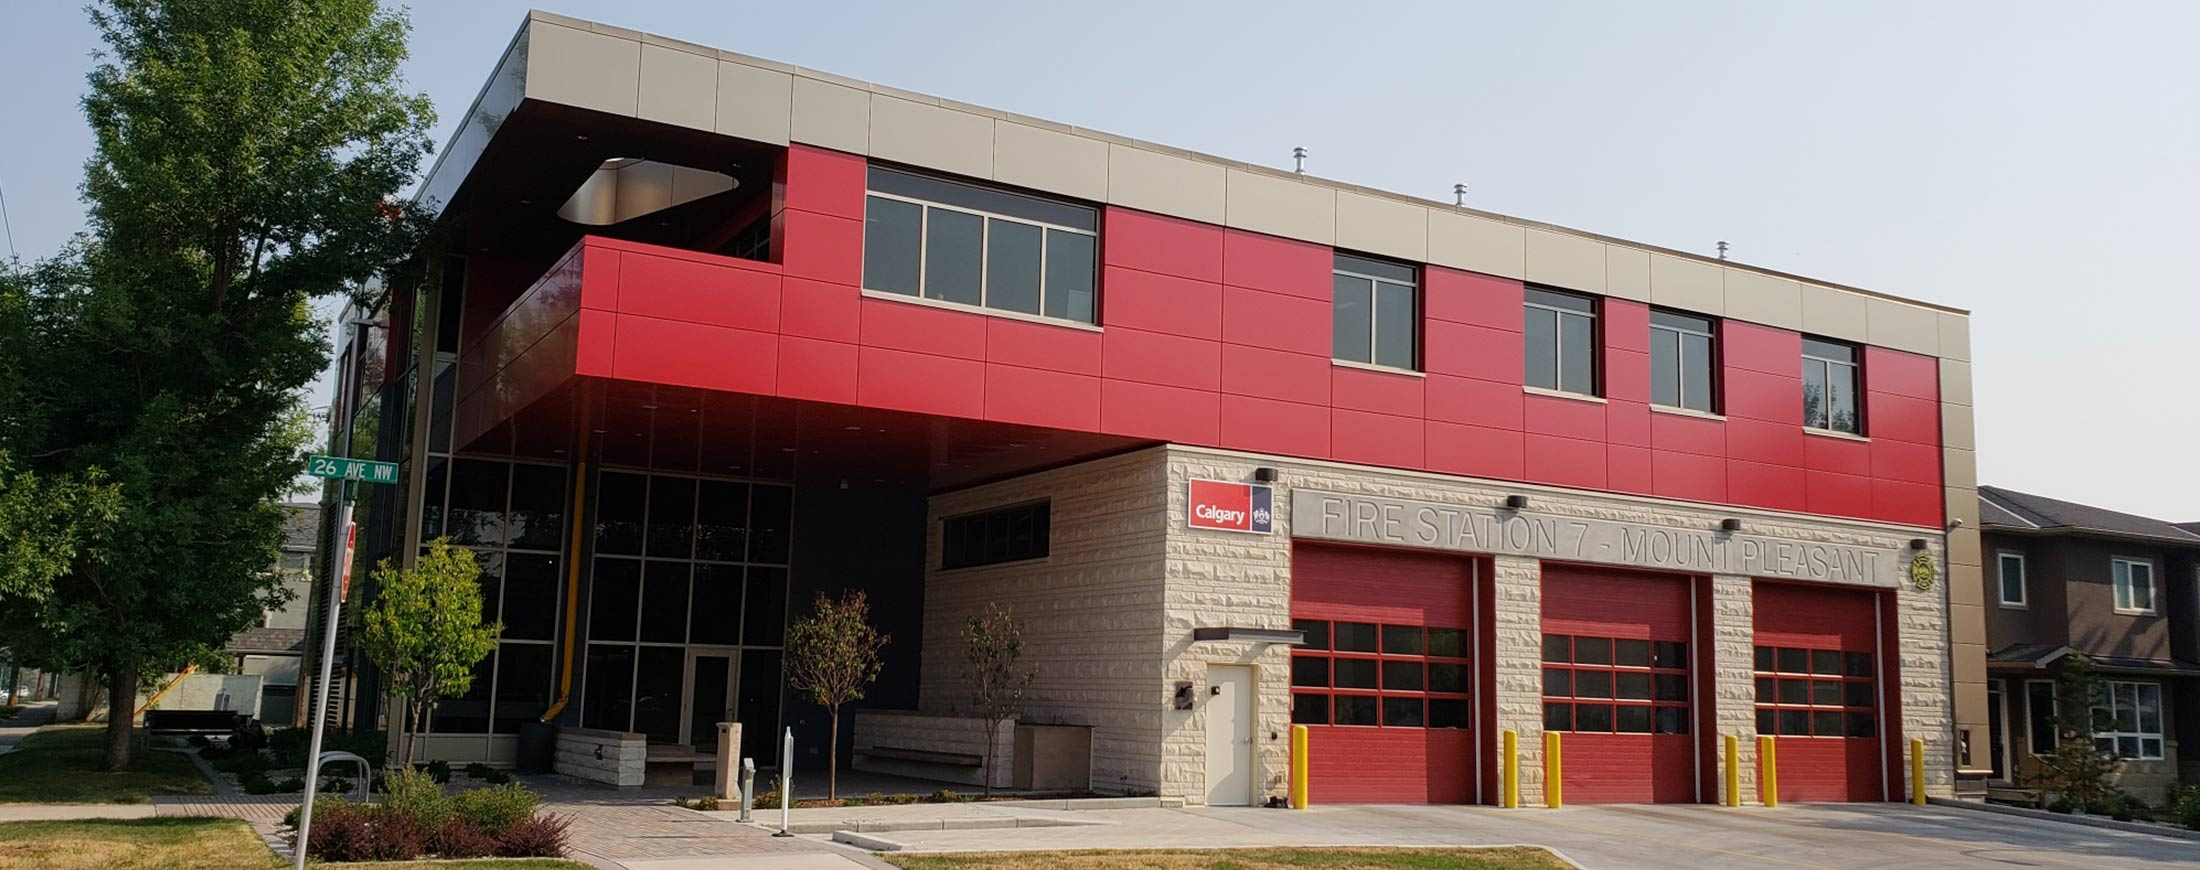 Calgary Fire Station - Mechanical Contractor Calgary